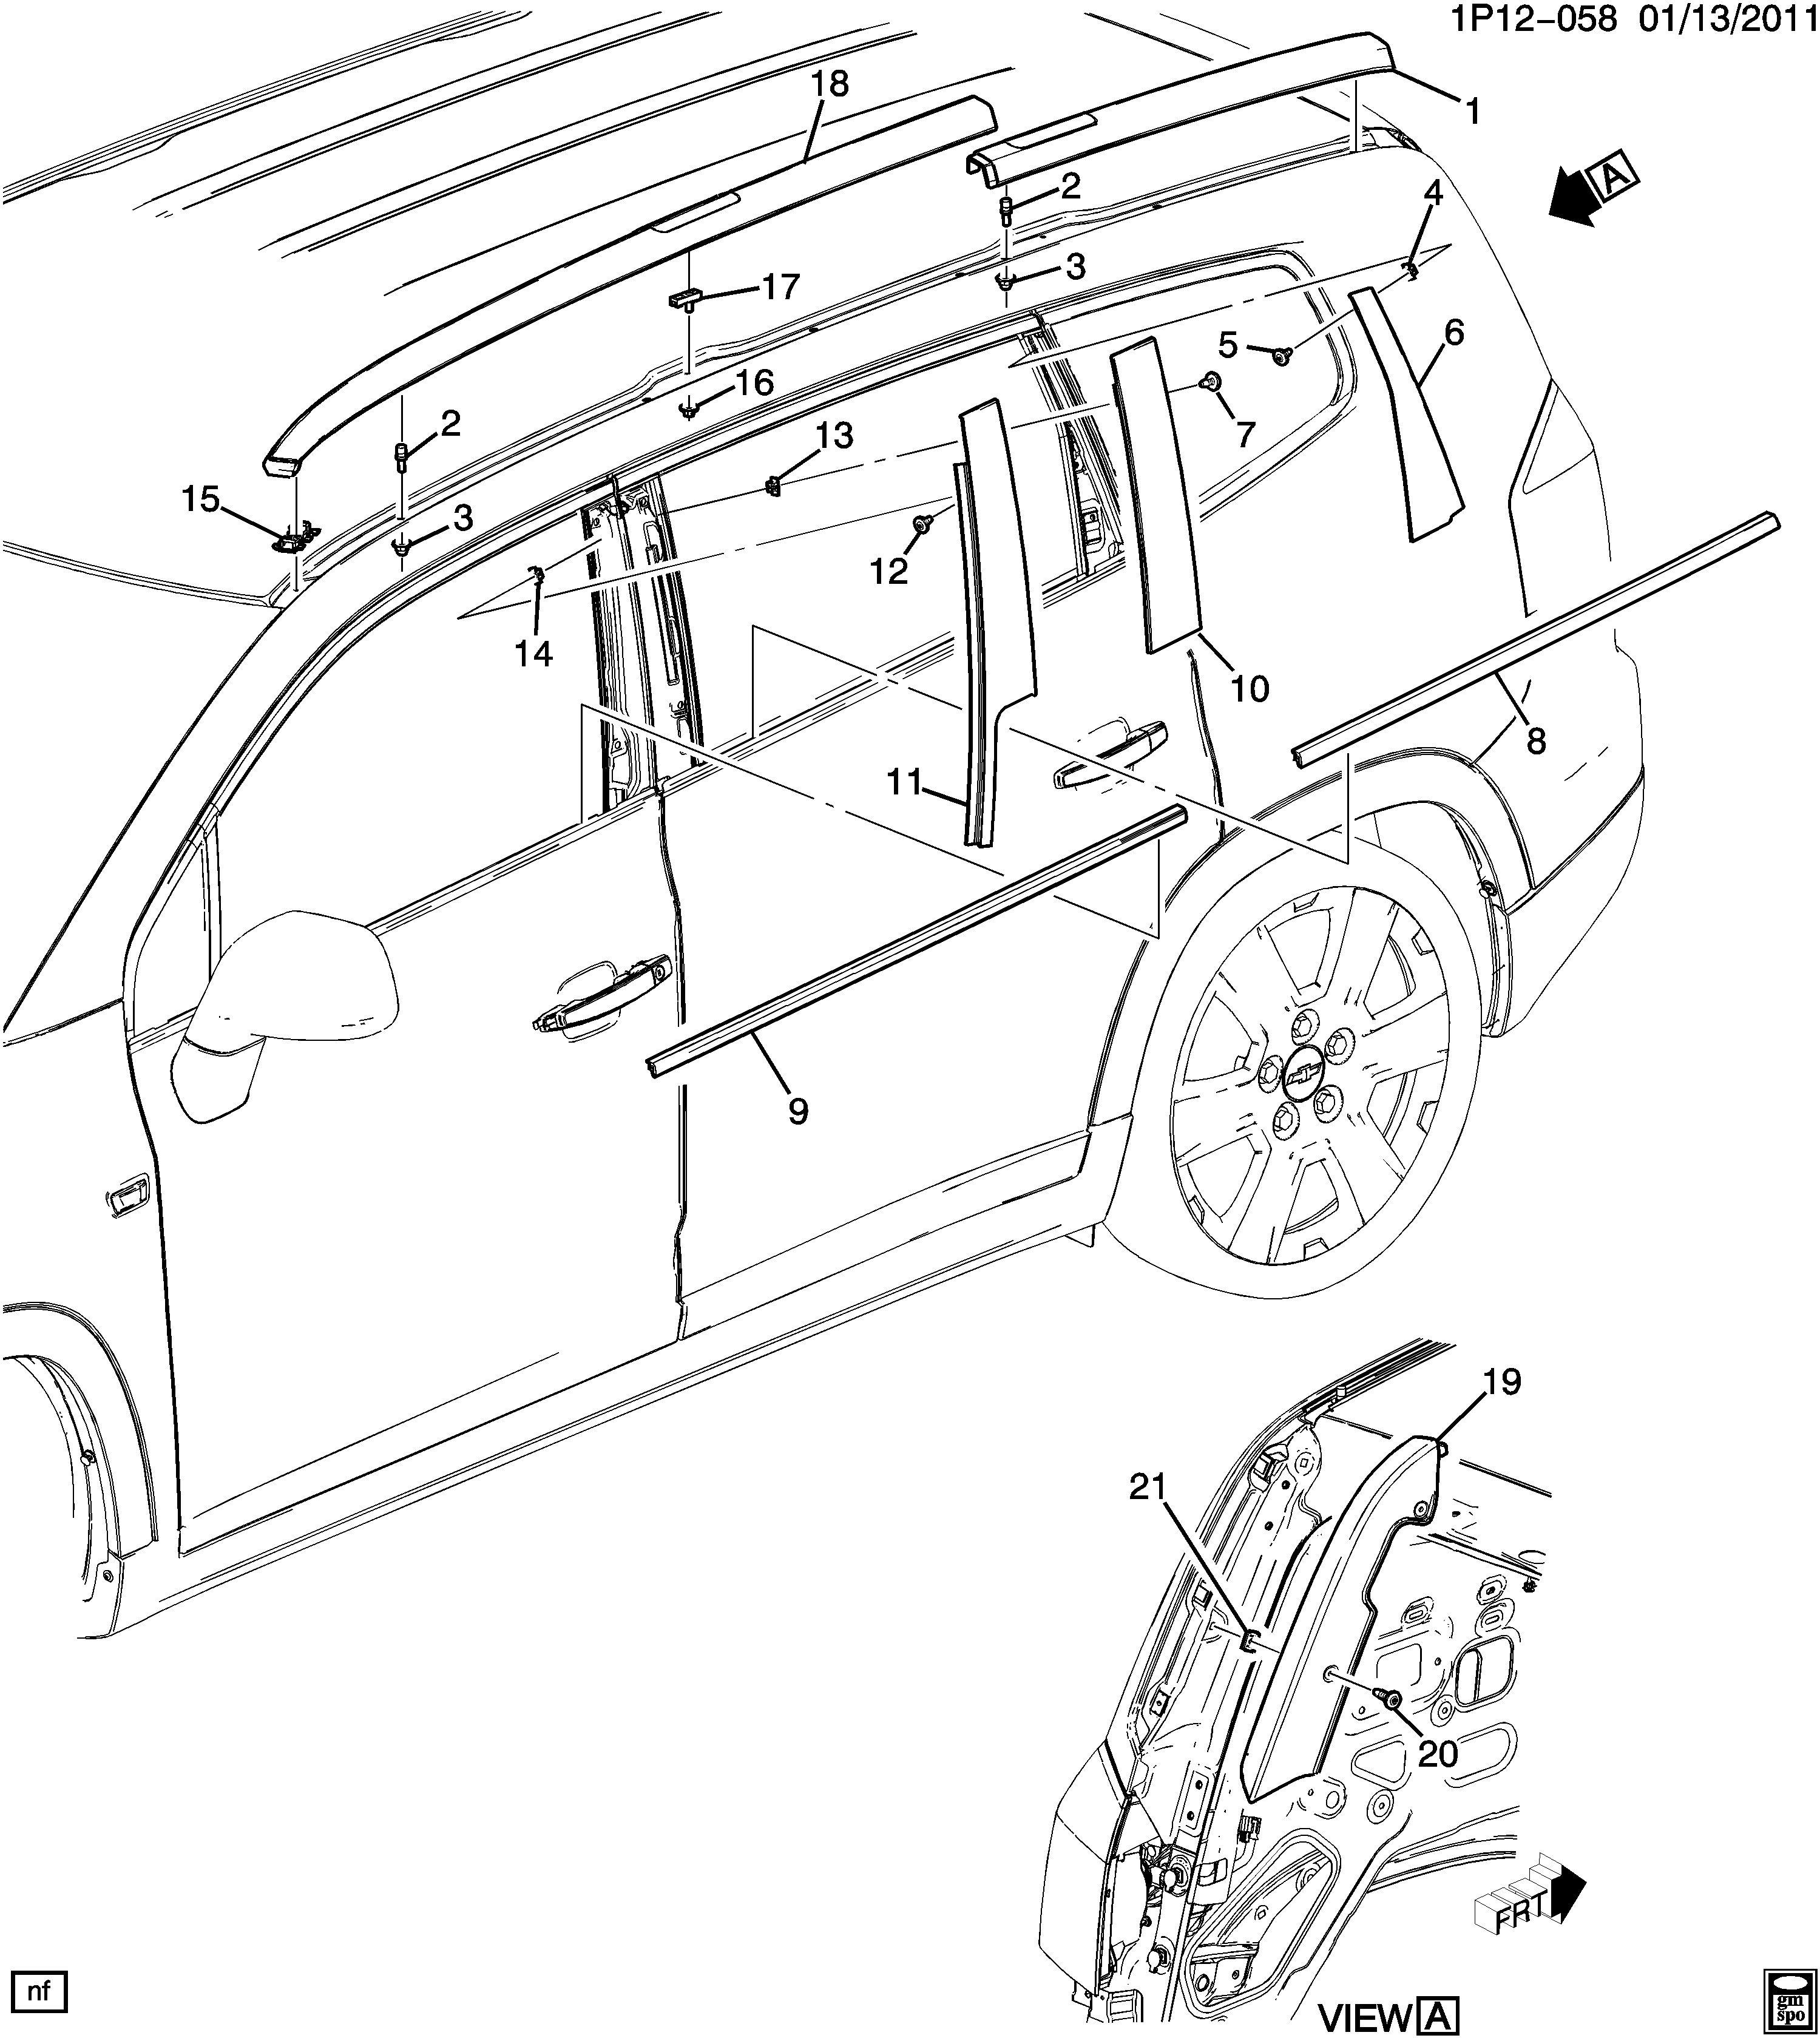 1987 toyota pickup vacuum line diagram cell respiration cycle mazda b2000 carburetor auto